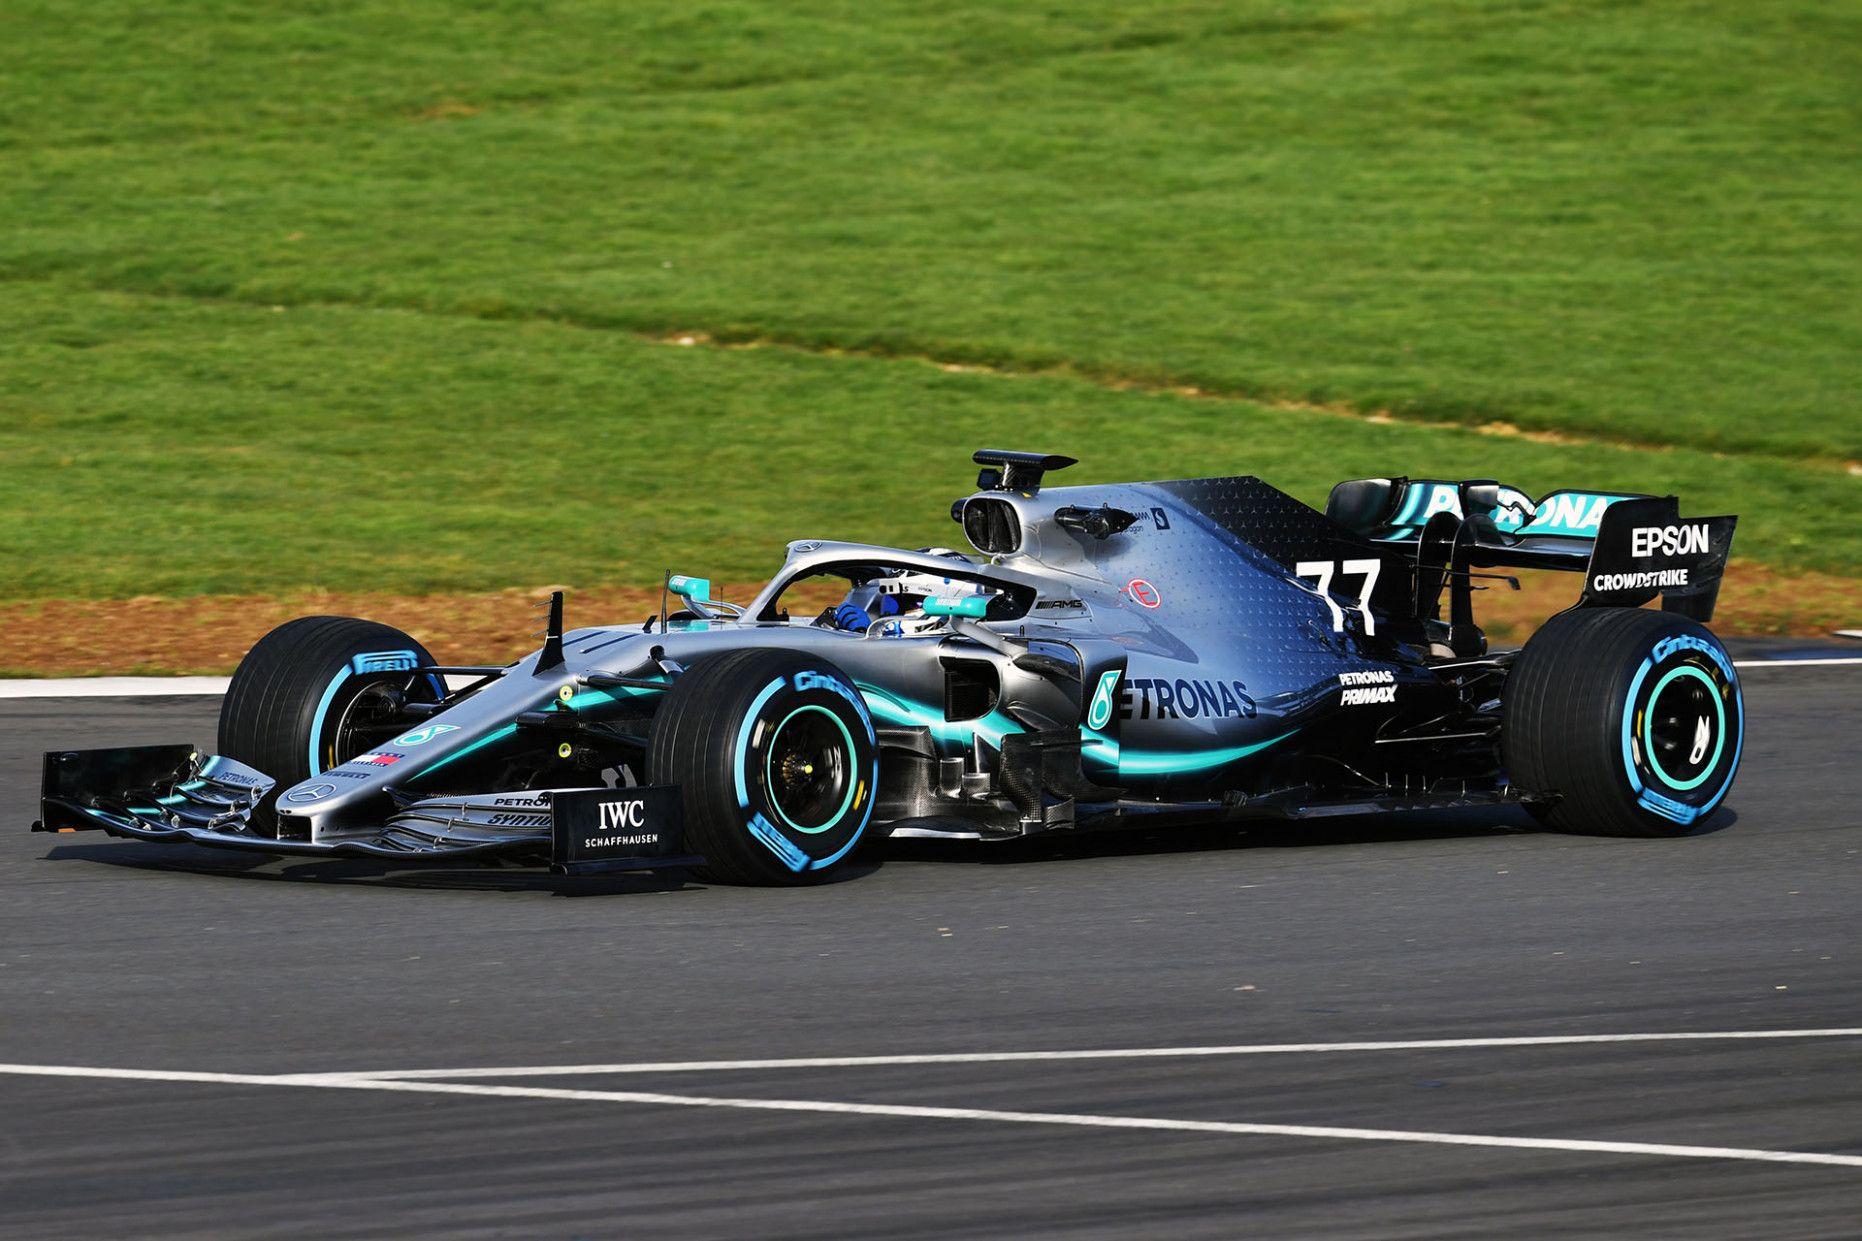 Mercedes W10 F1 2020 Engine Worth Design And Assessment In 2020 Mercedes New Car Mercedes Formula 1 Car